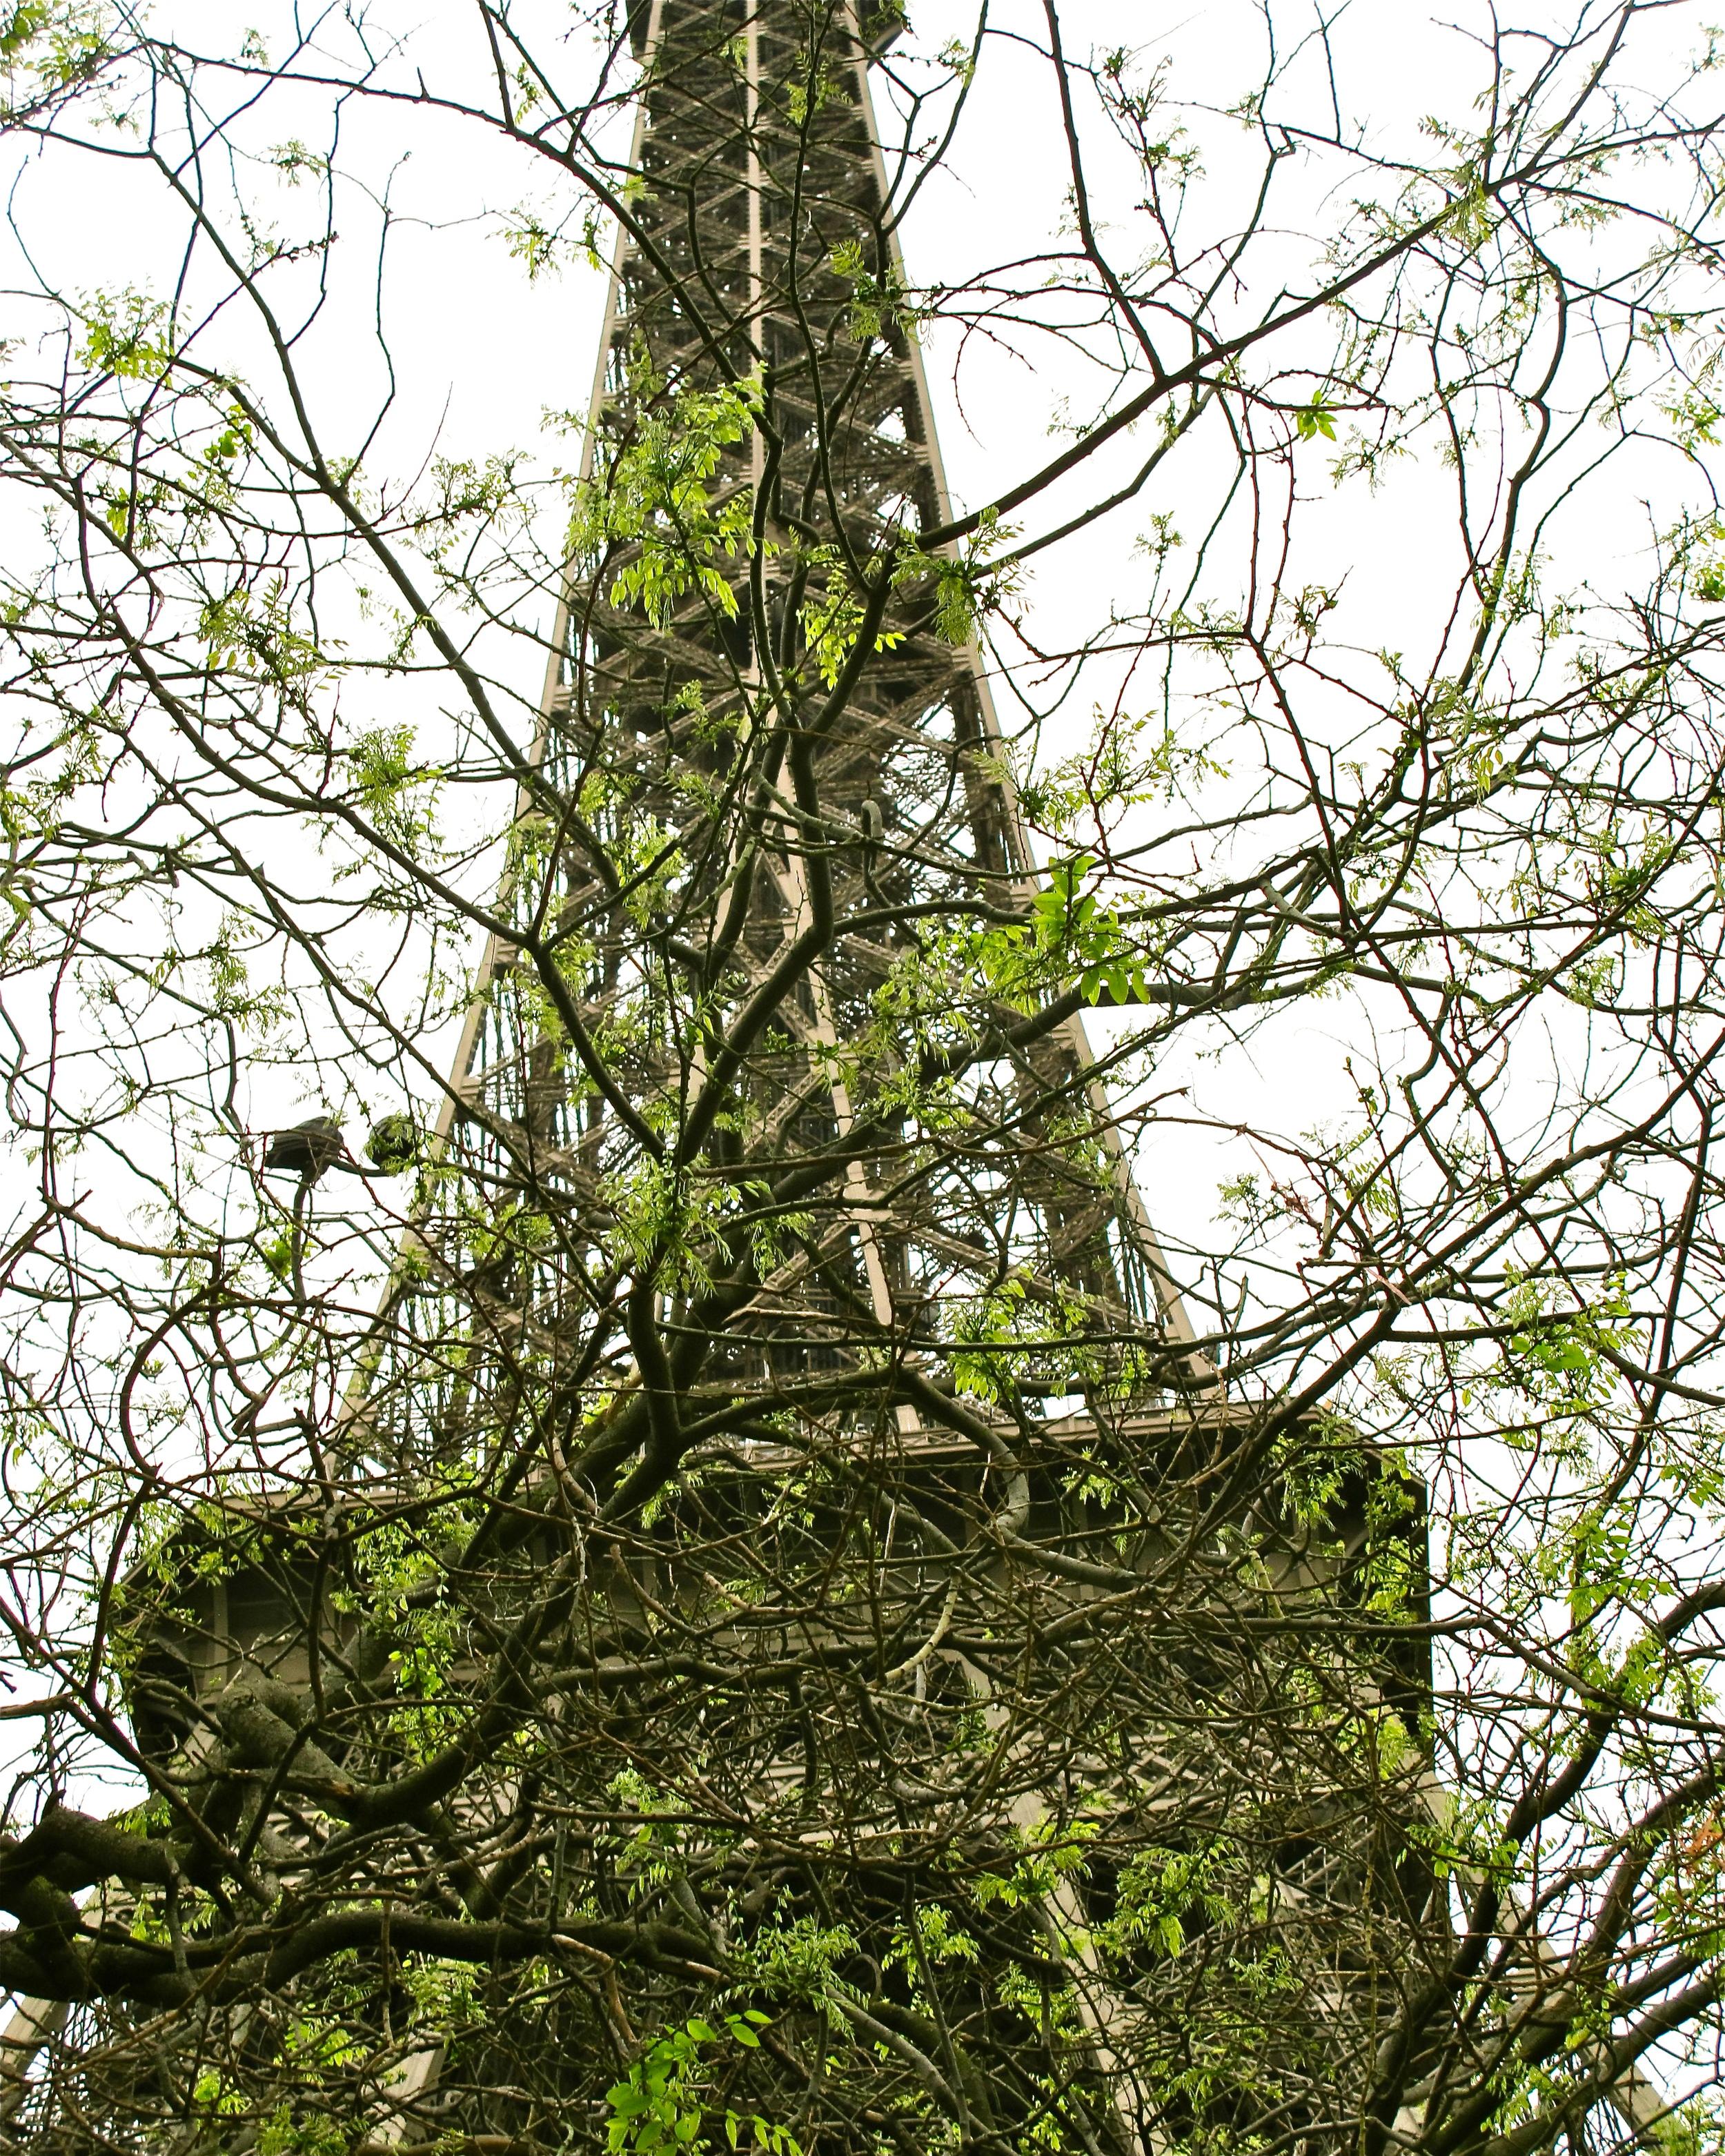 Greening of the Eiffel